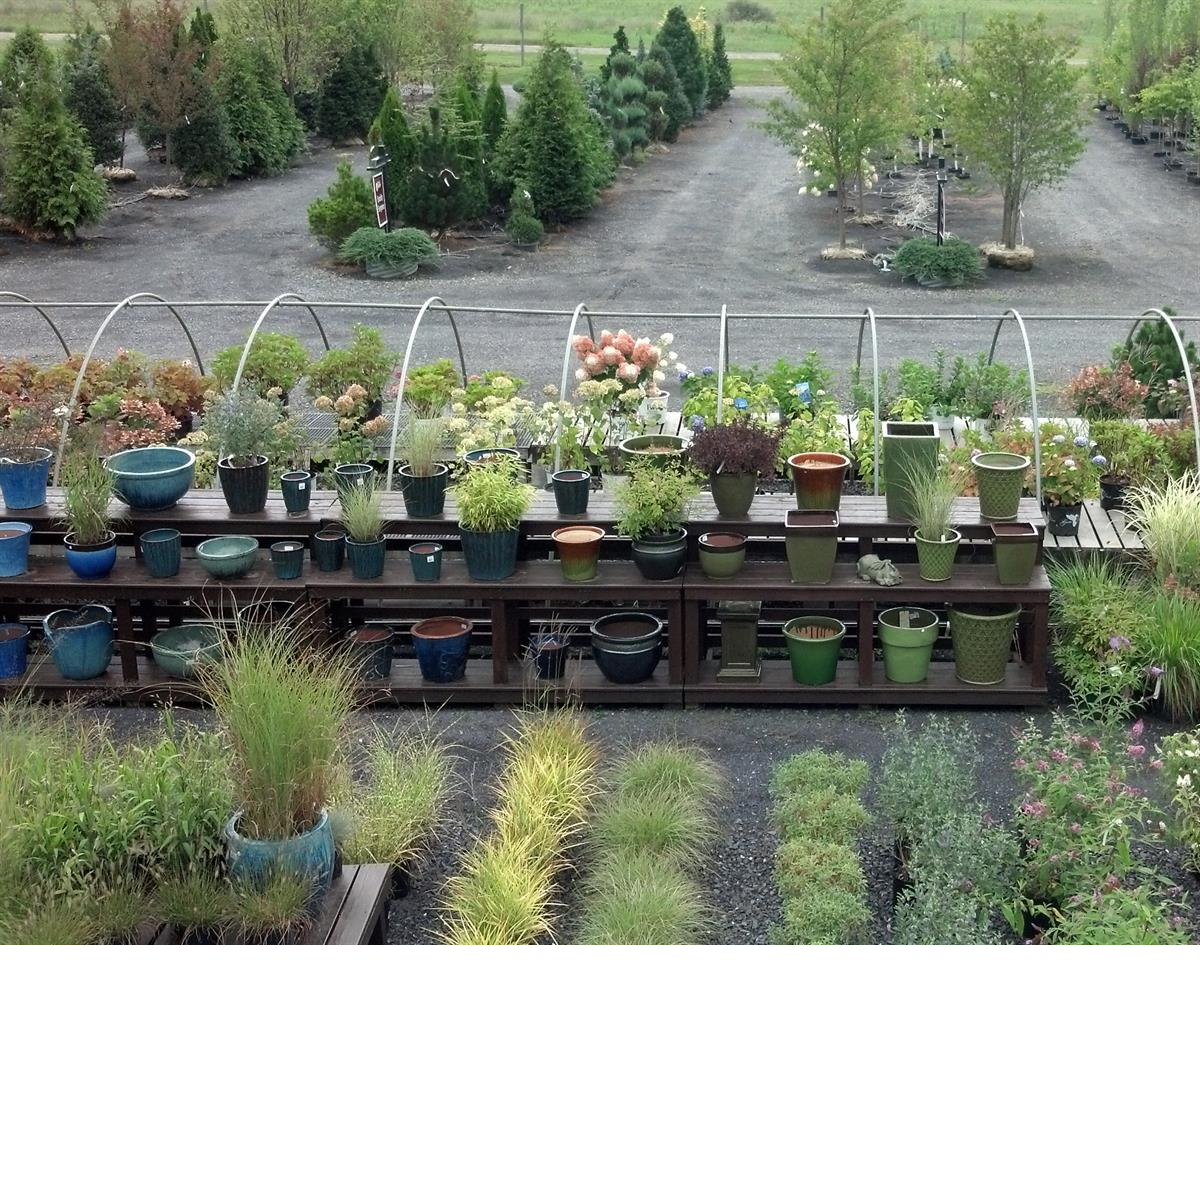 Overview_of_nursery